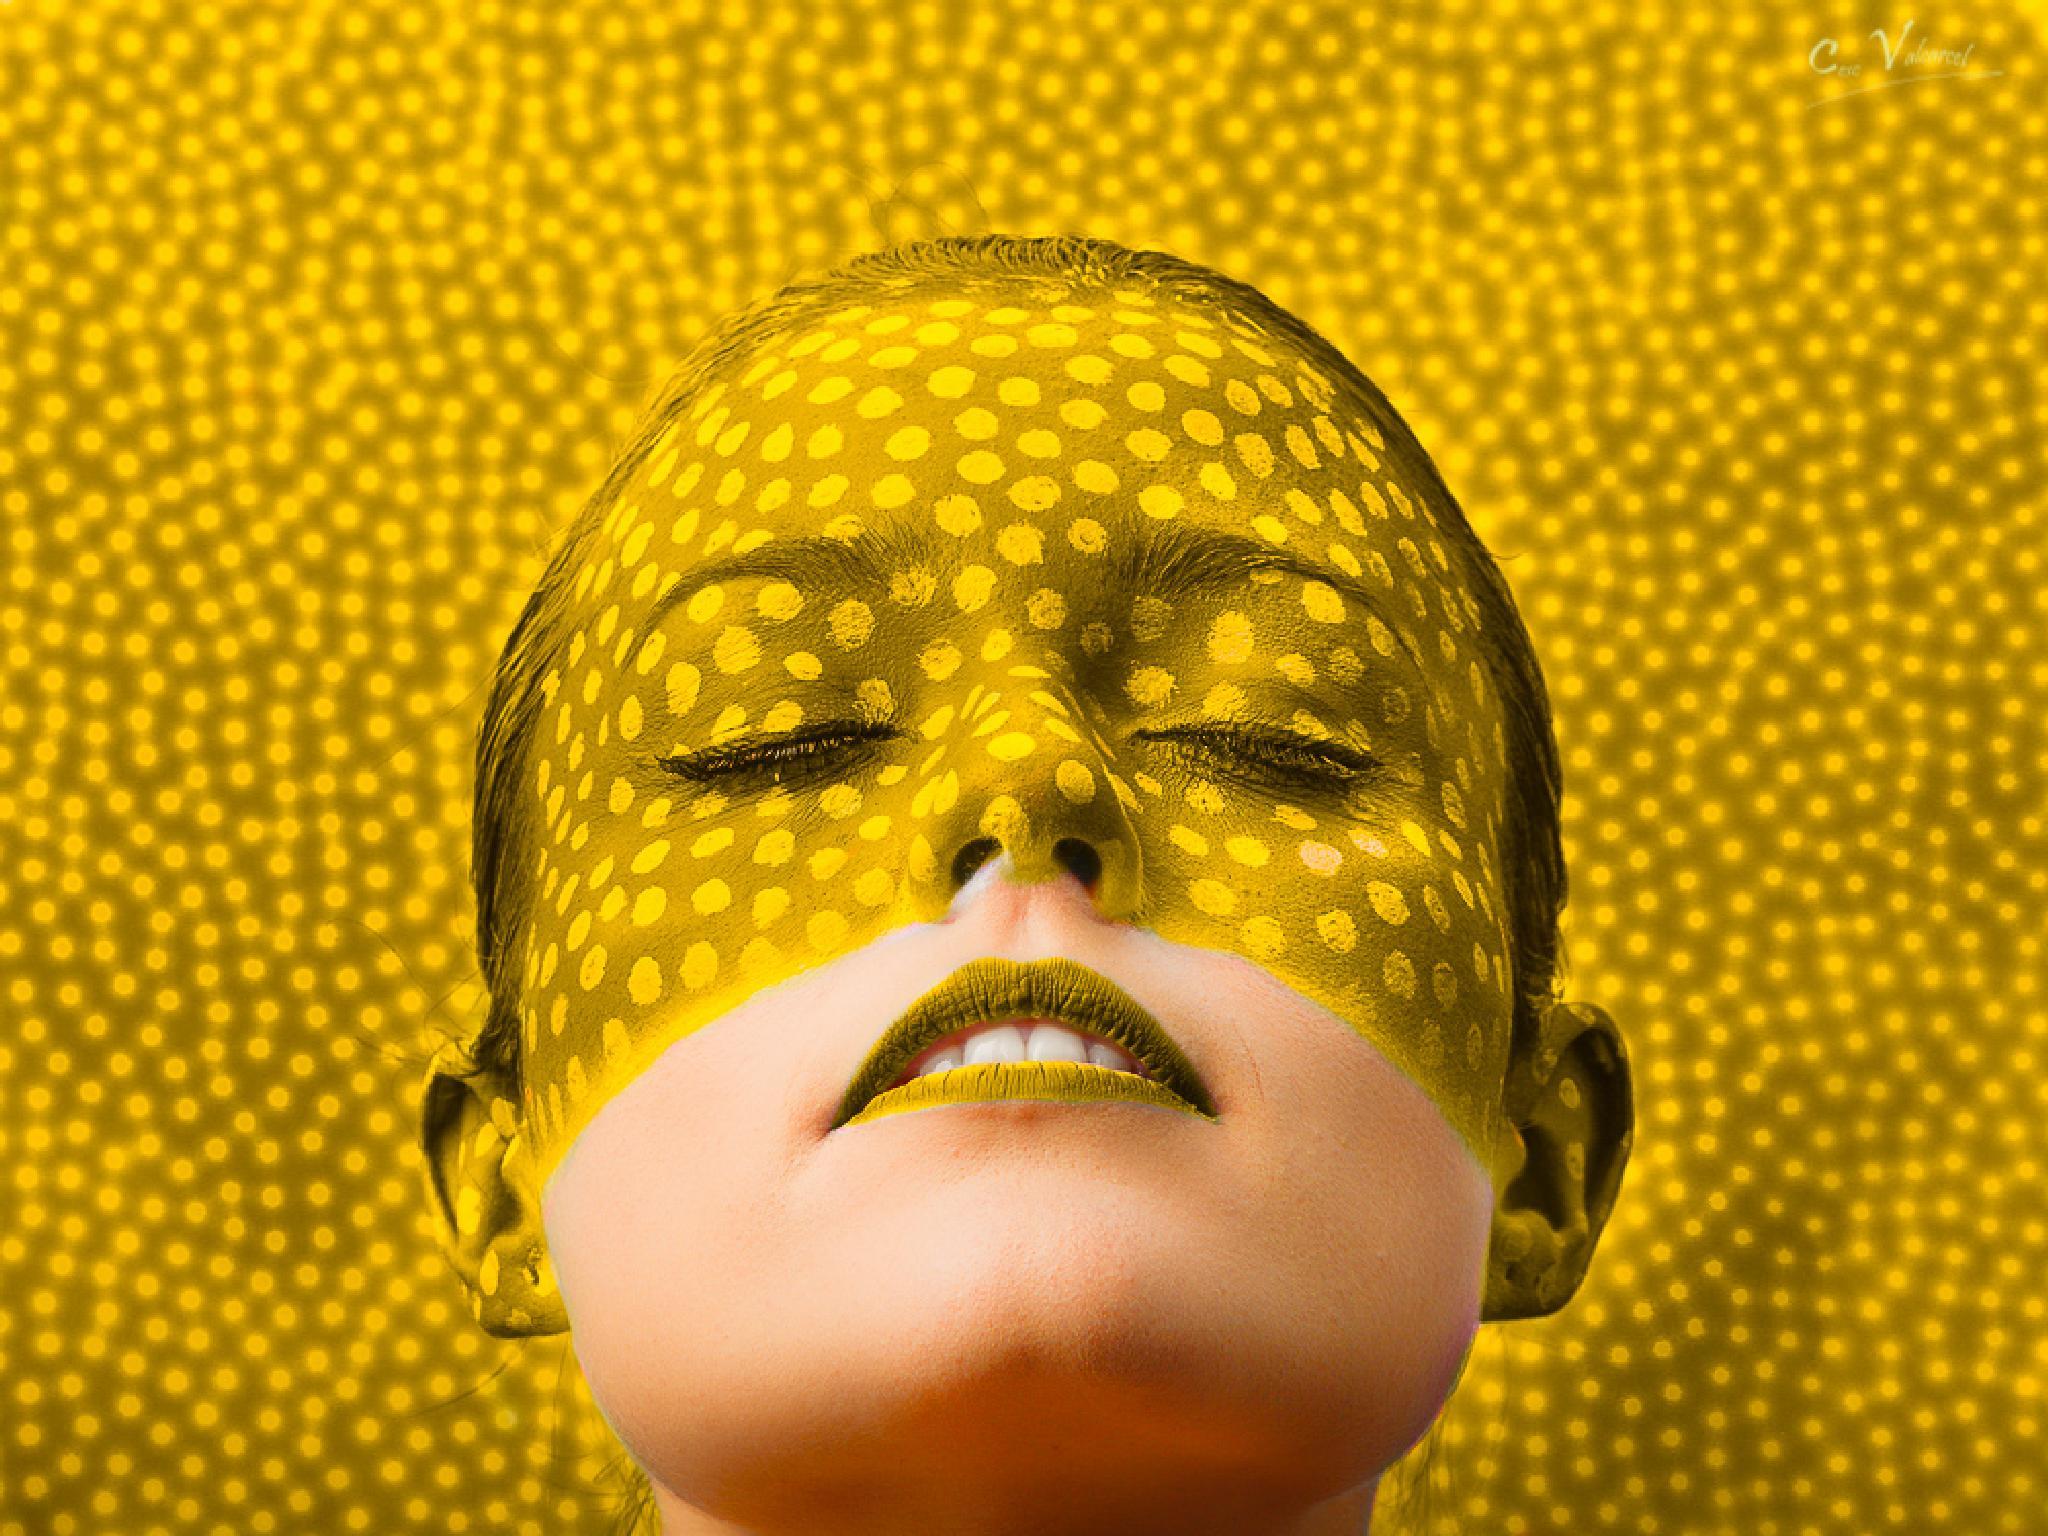 Strange Make-up by Cesc Valcarcel